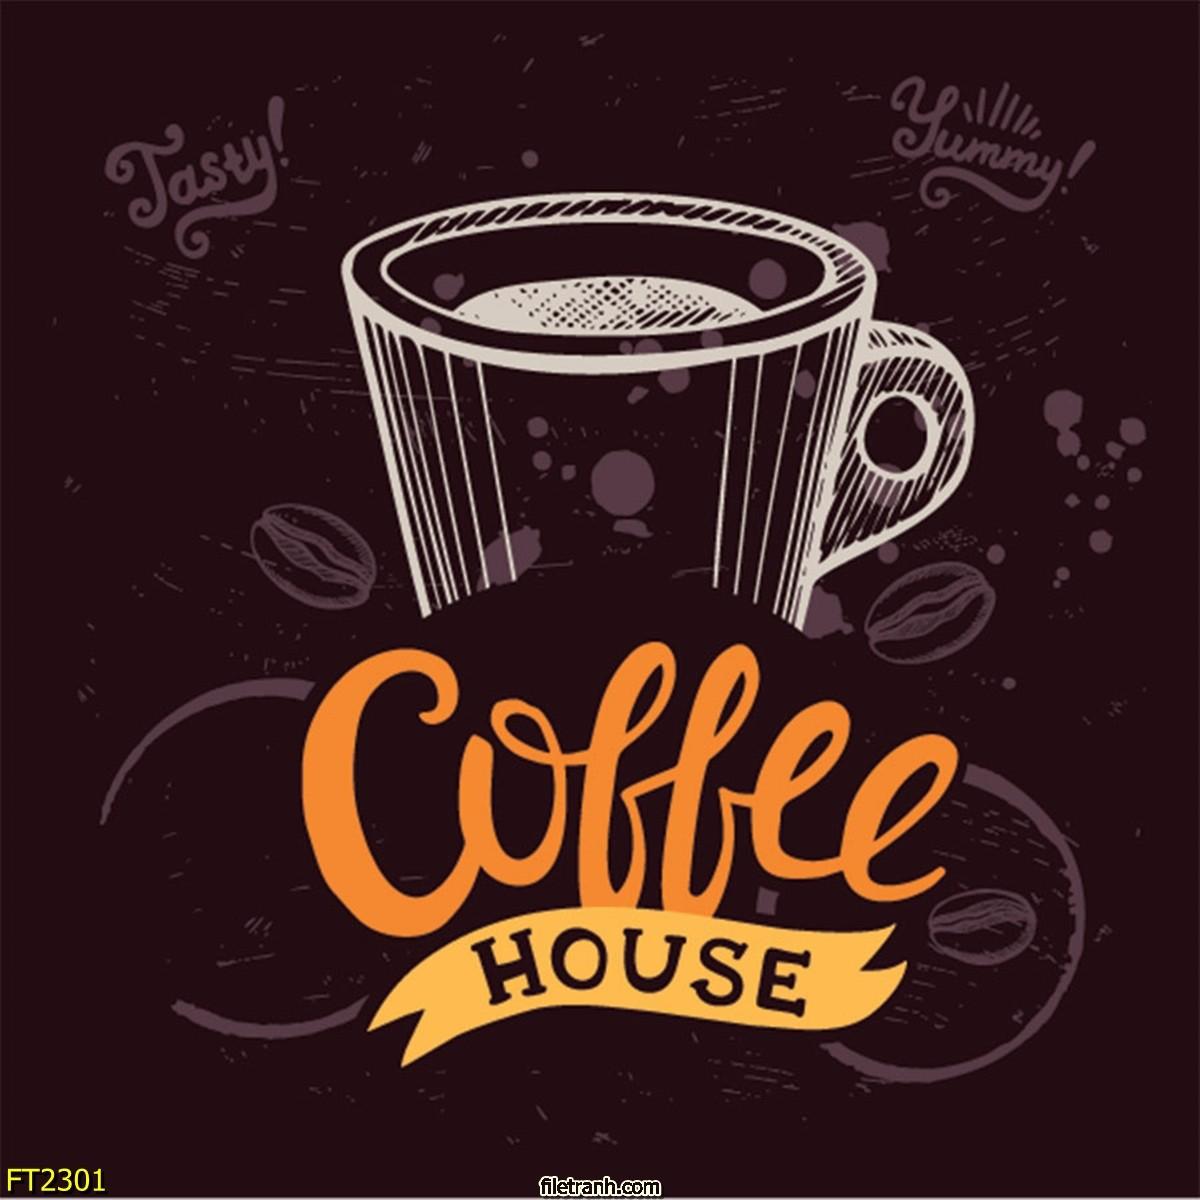 http://filetranh.com/tuong-cafe/file-psd-tuong-quan-ca-phe-ft2301.html